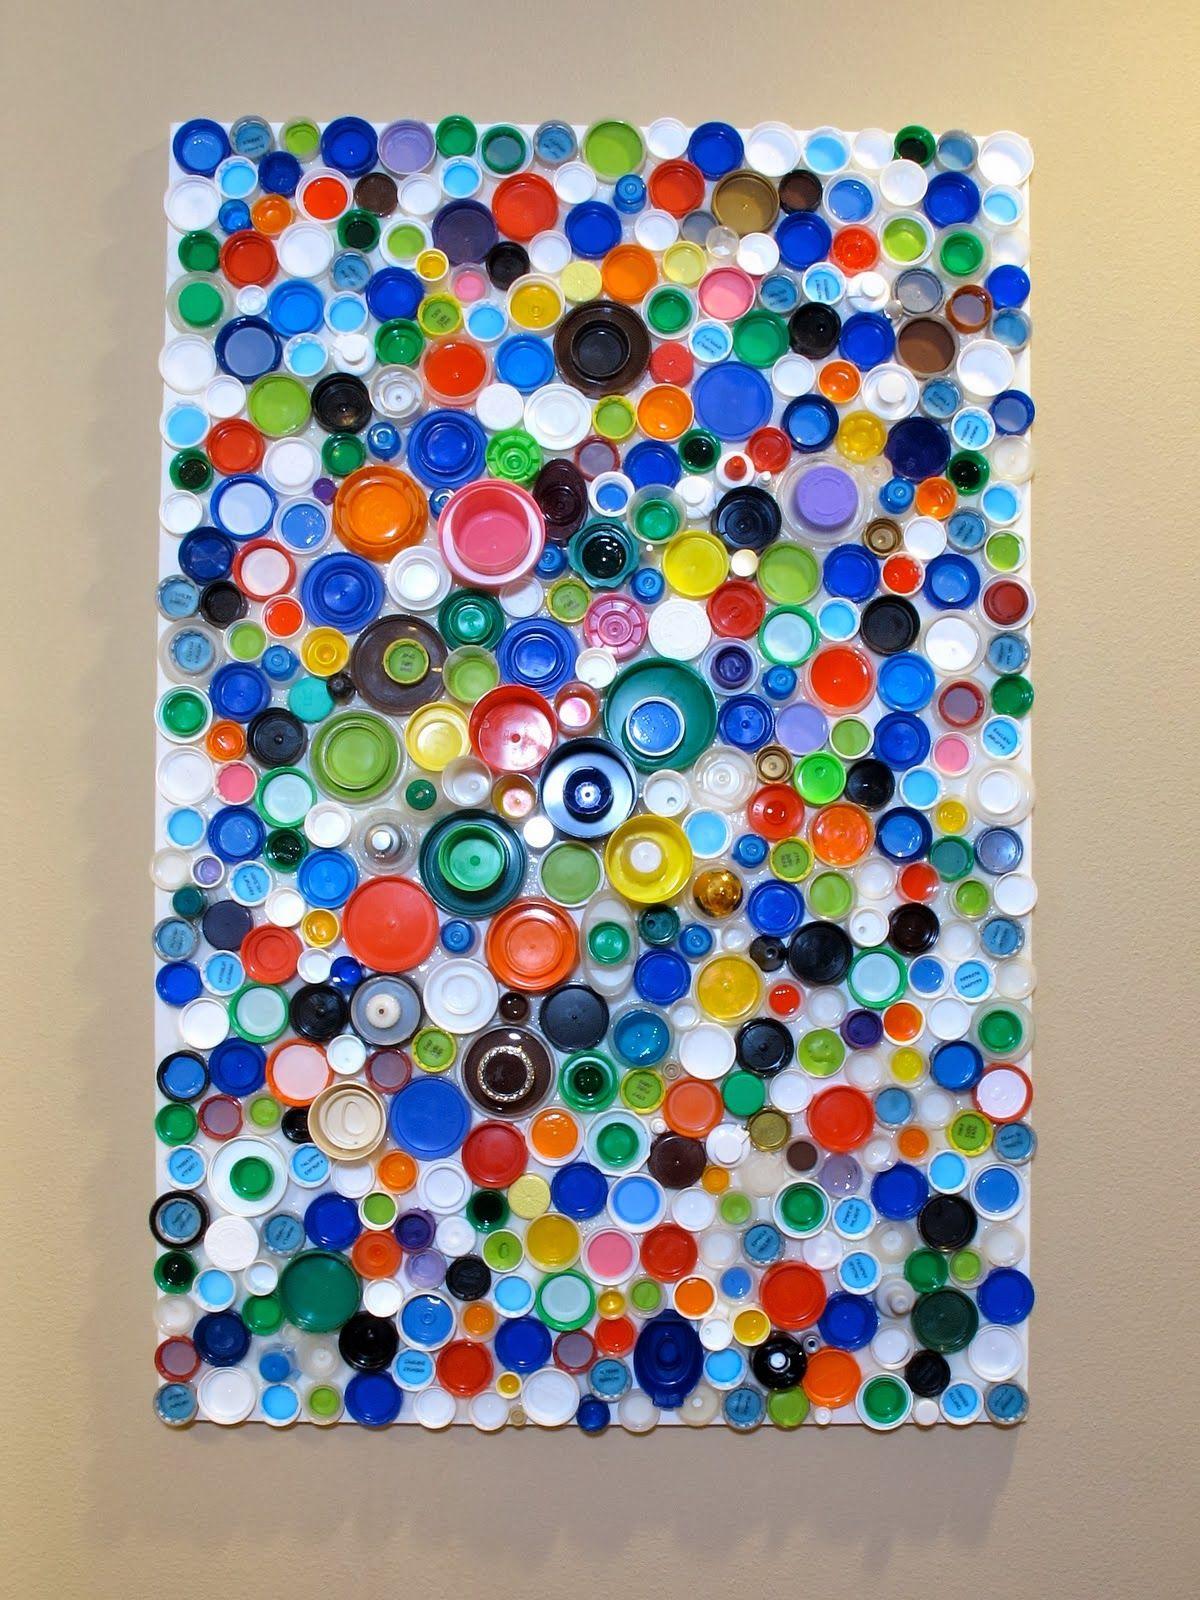 BluKatKraft DIY Recycled Plastic Bottle Crafts Kids